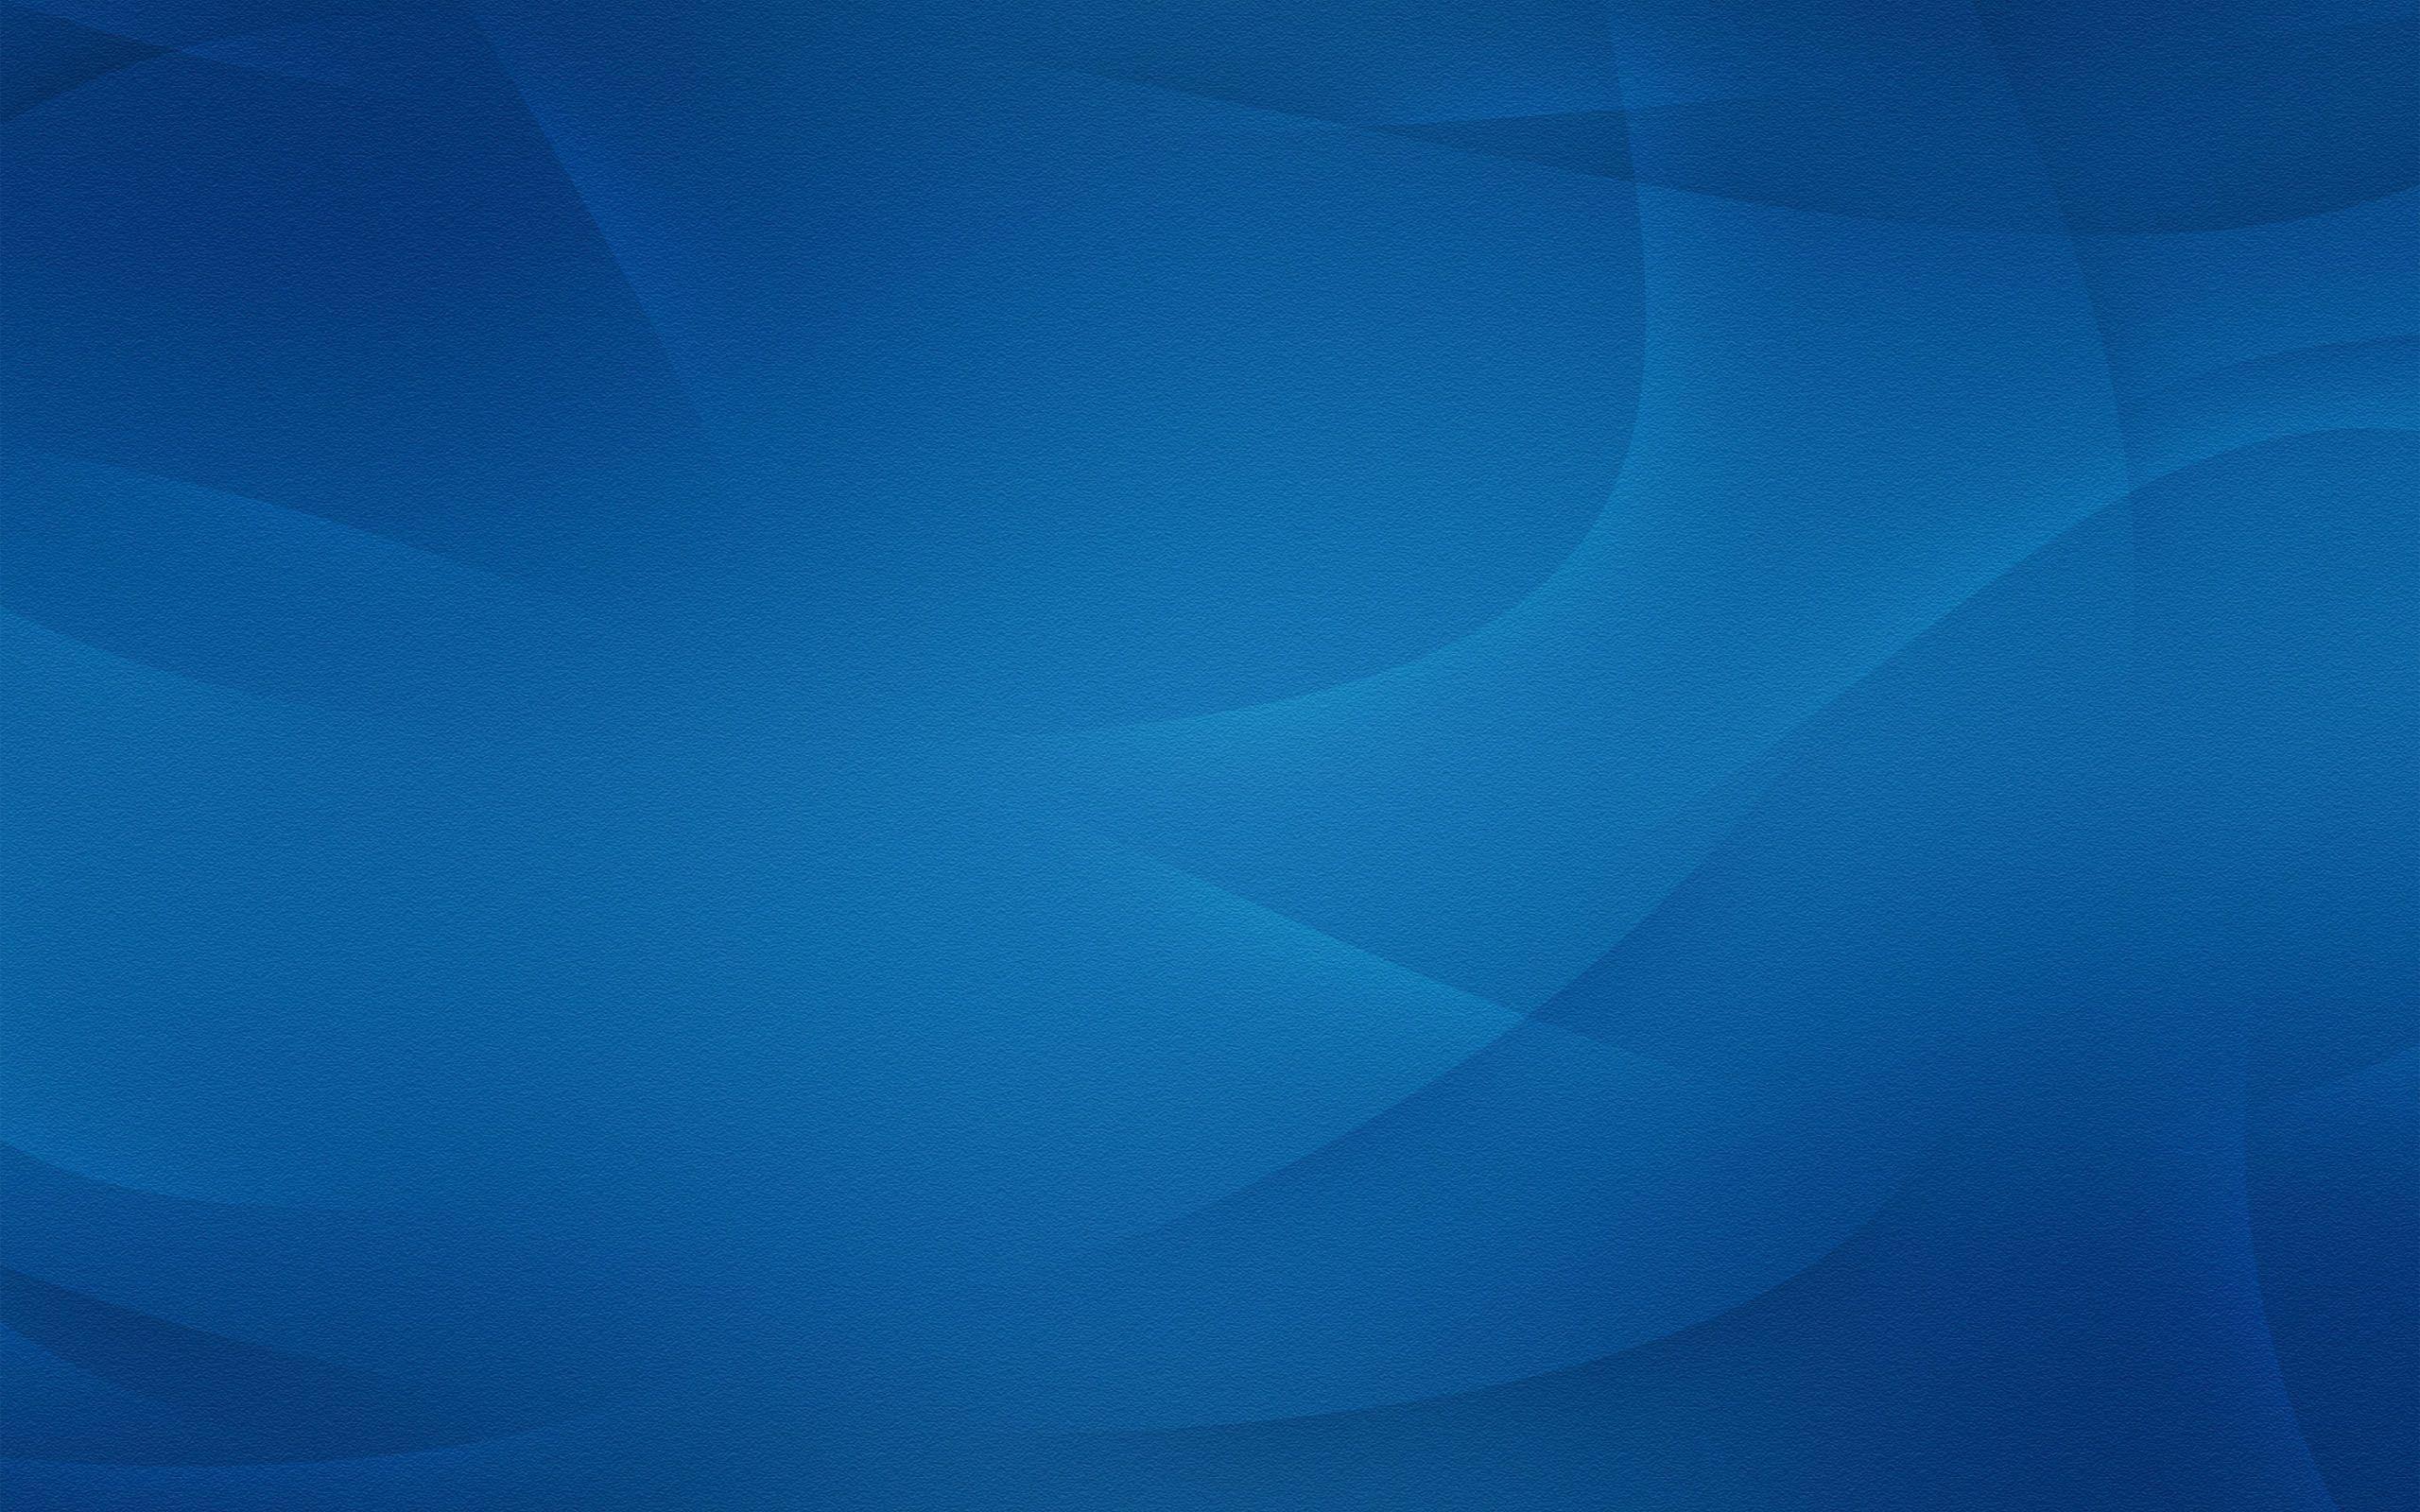 200+ Wallpaper Abstrak Bunga Biru HD Paling Keren